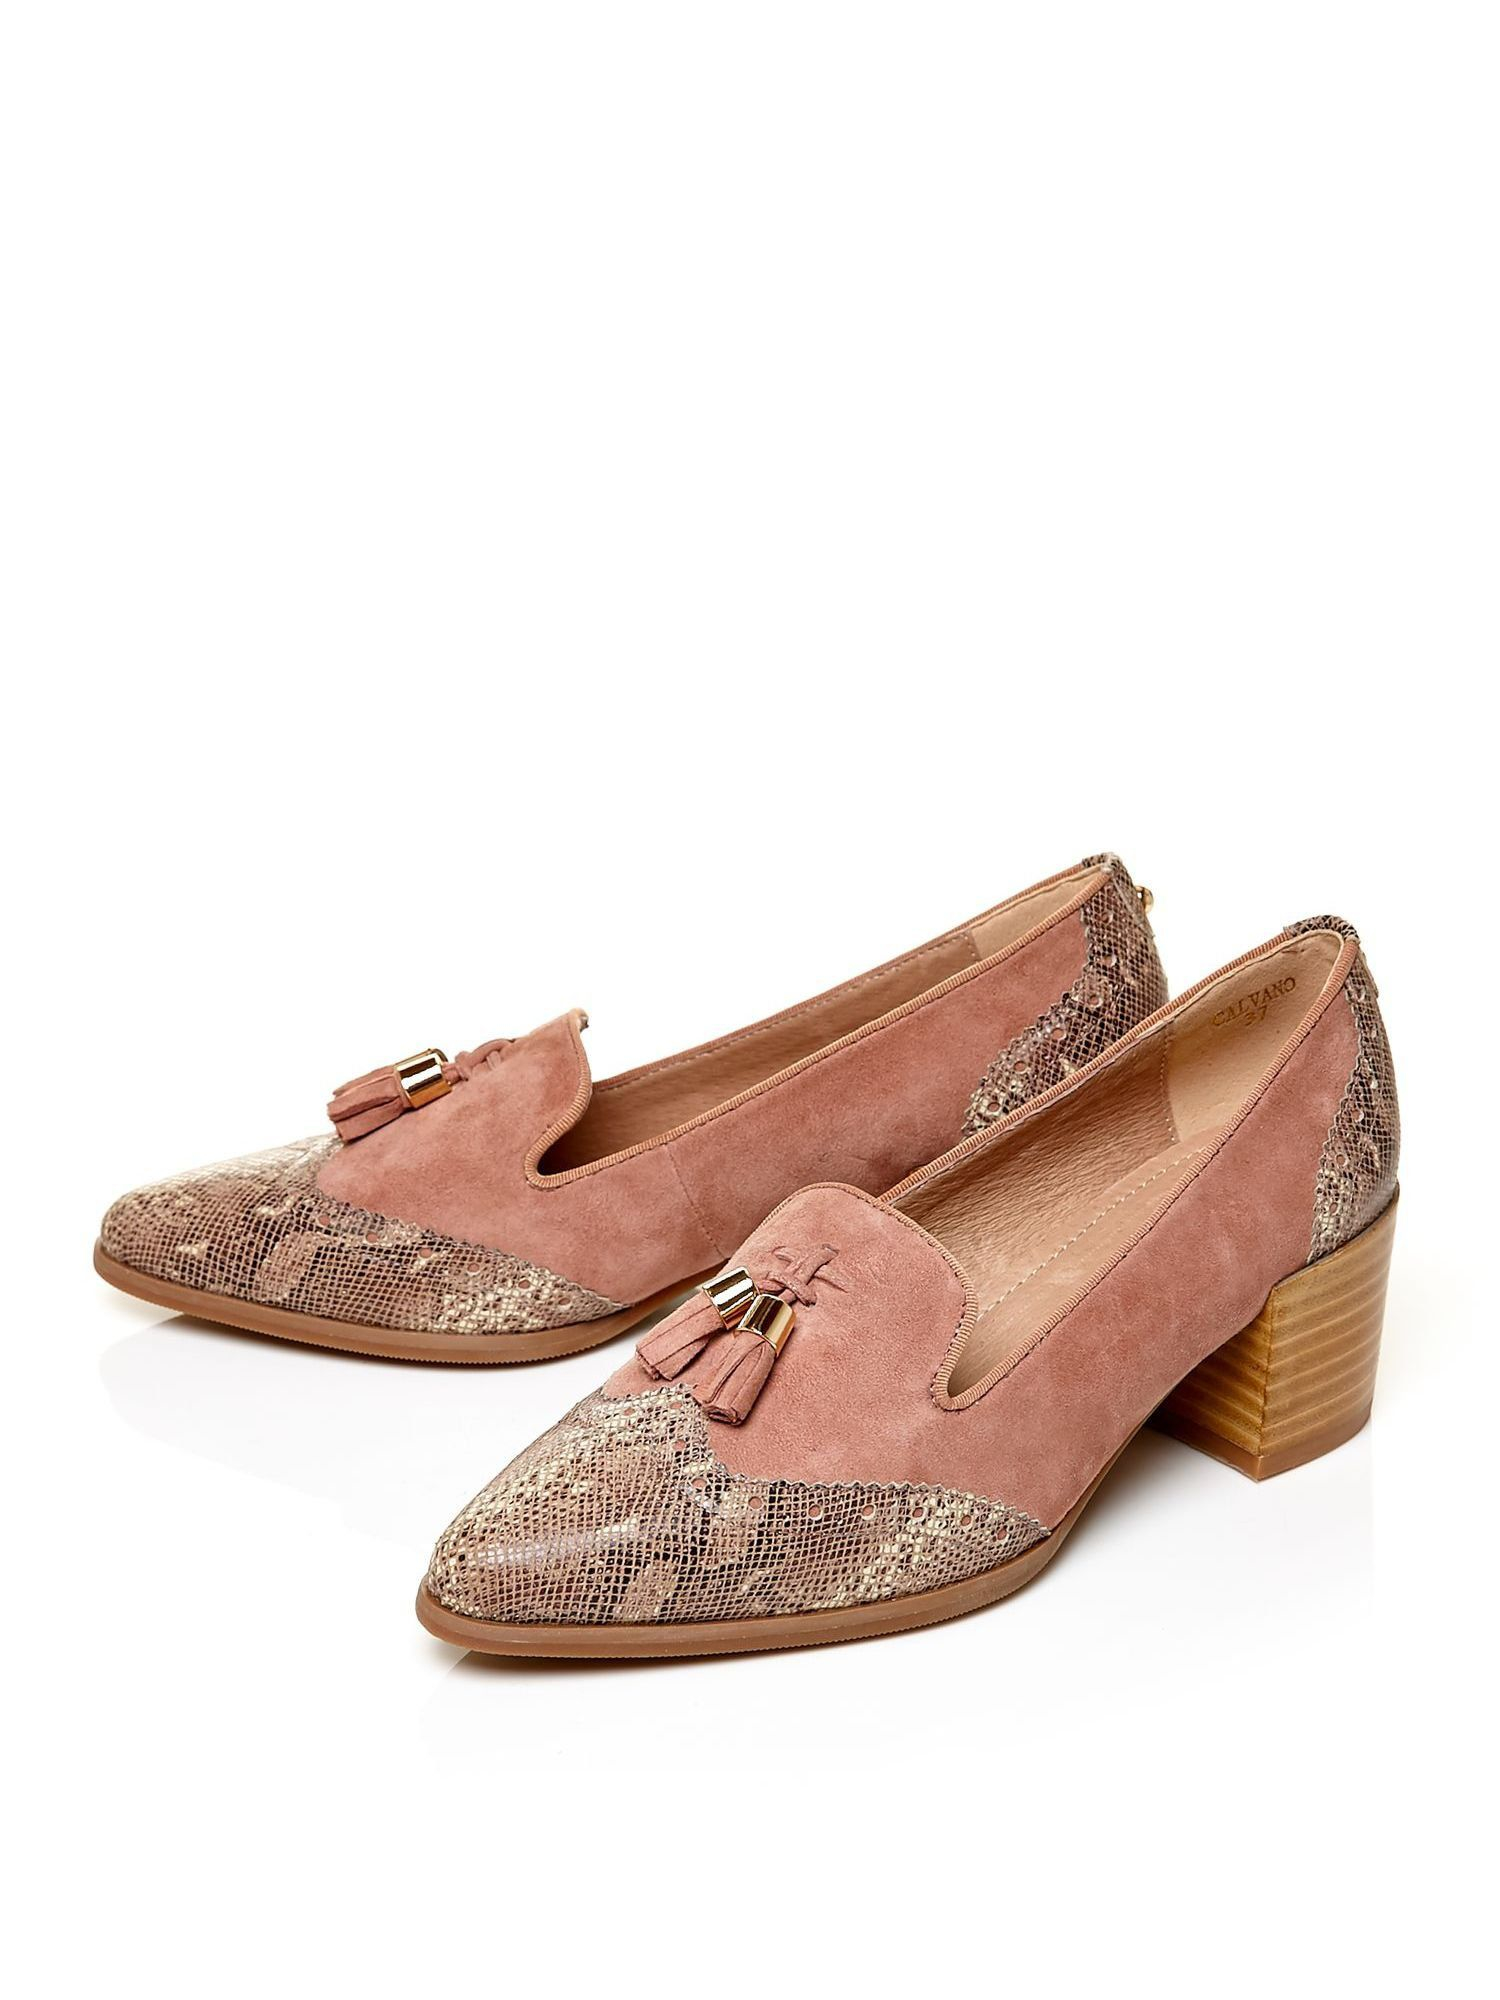 Moda In Pelle Calvano Medium Smart Shoes In Brown